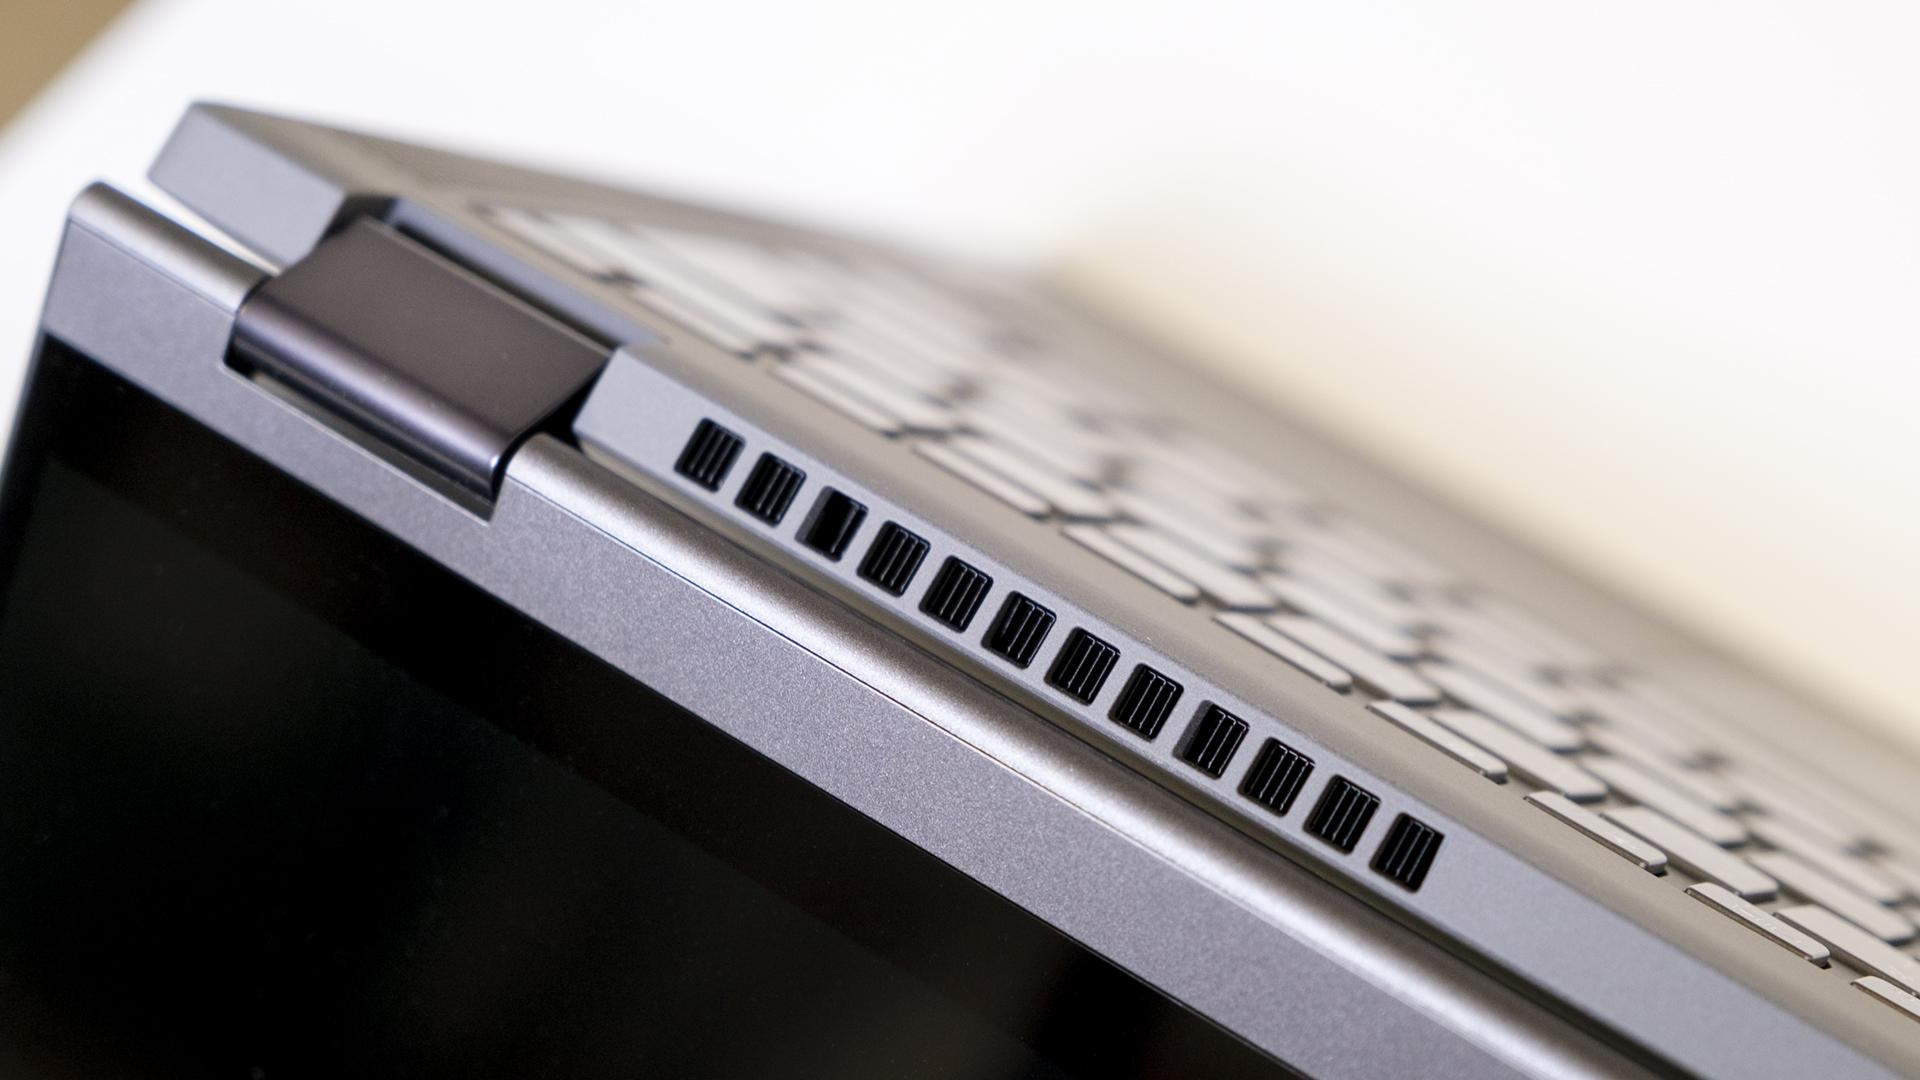 Lenovo IdeaPad Flex 5 AMD Ryzen 5700U Kühlauslass